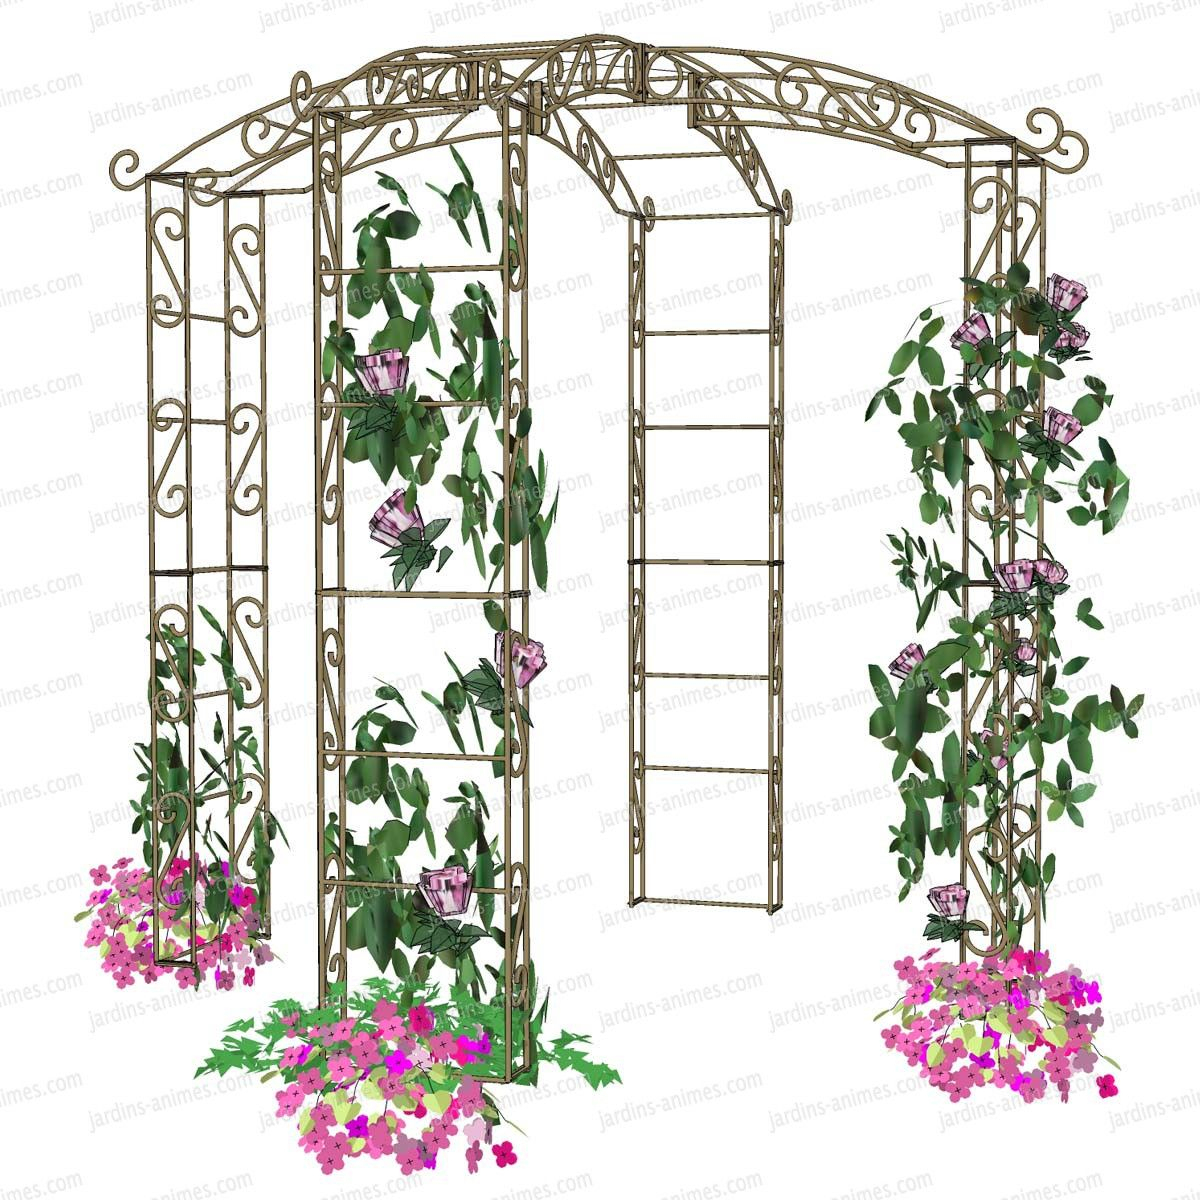 Gloriette Kiosque En Fer 4 Pieds Diam. 2.14M | Arche Jardin ... pour Kiosque Jardin Fer